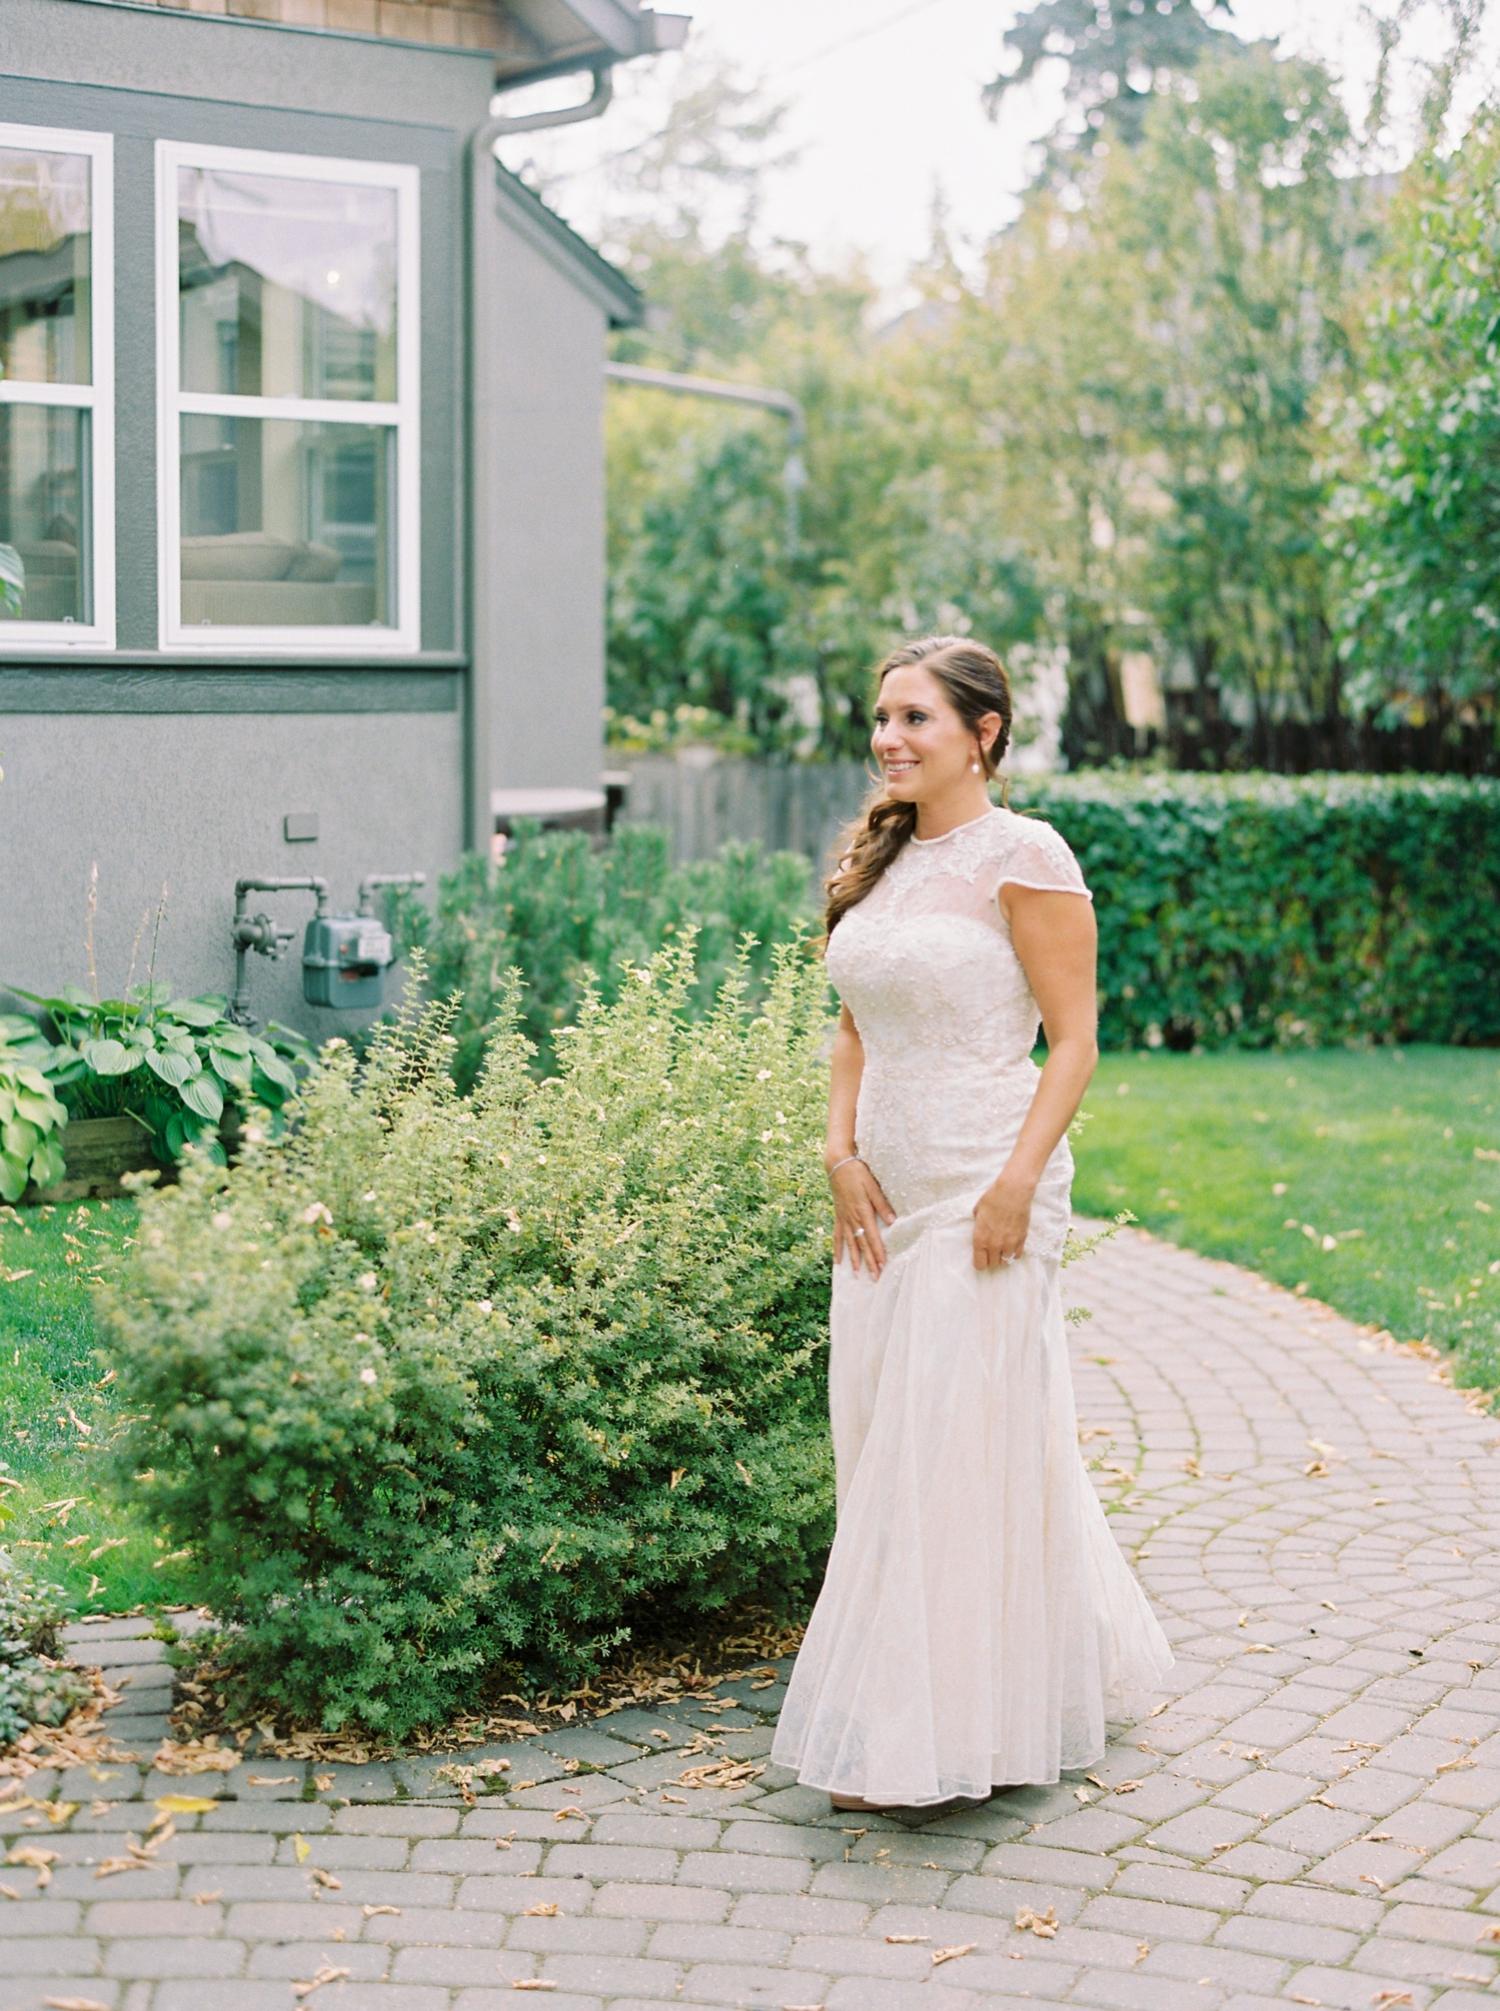 Calgary wedding photographers | fine art film | Justine Milton Photography | wedding inspiration | bridesmaids | wedding dress | bride portraits